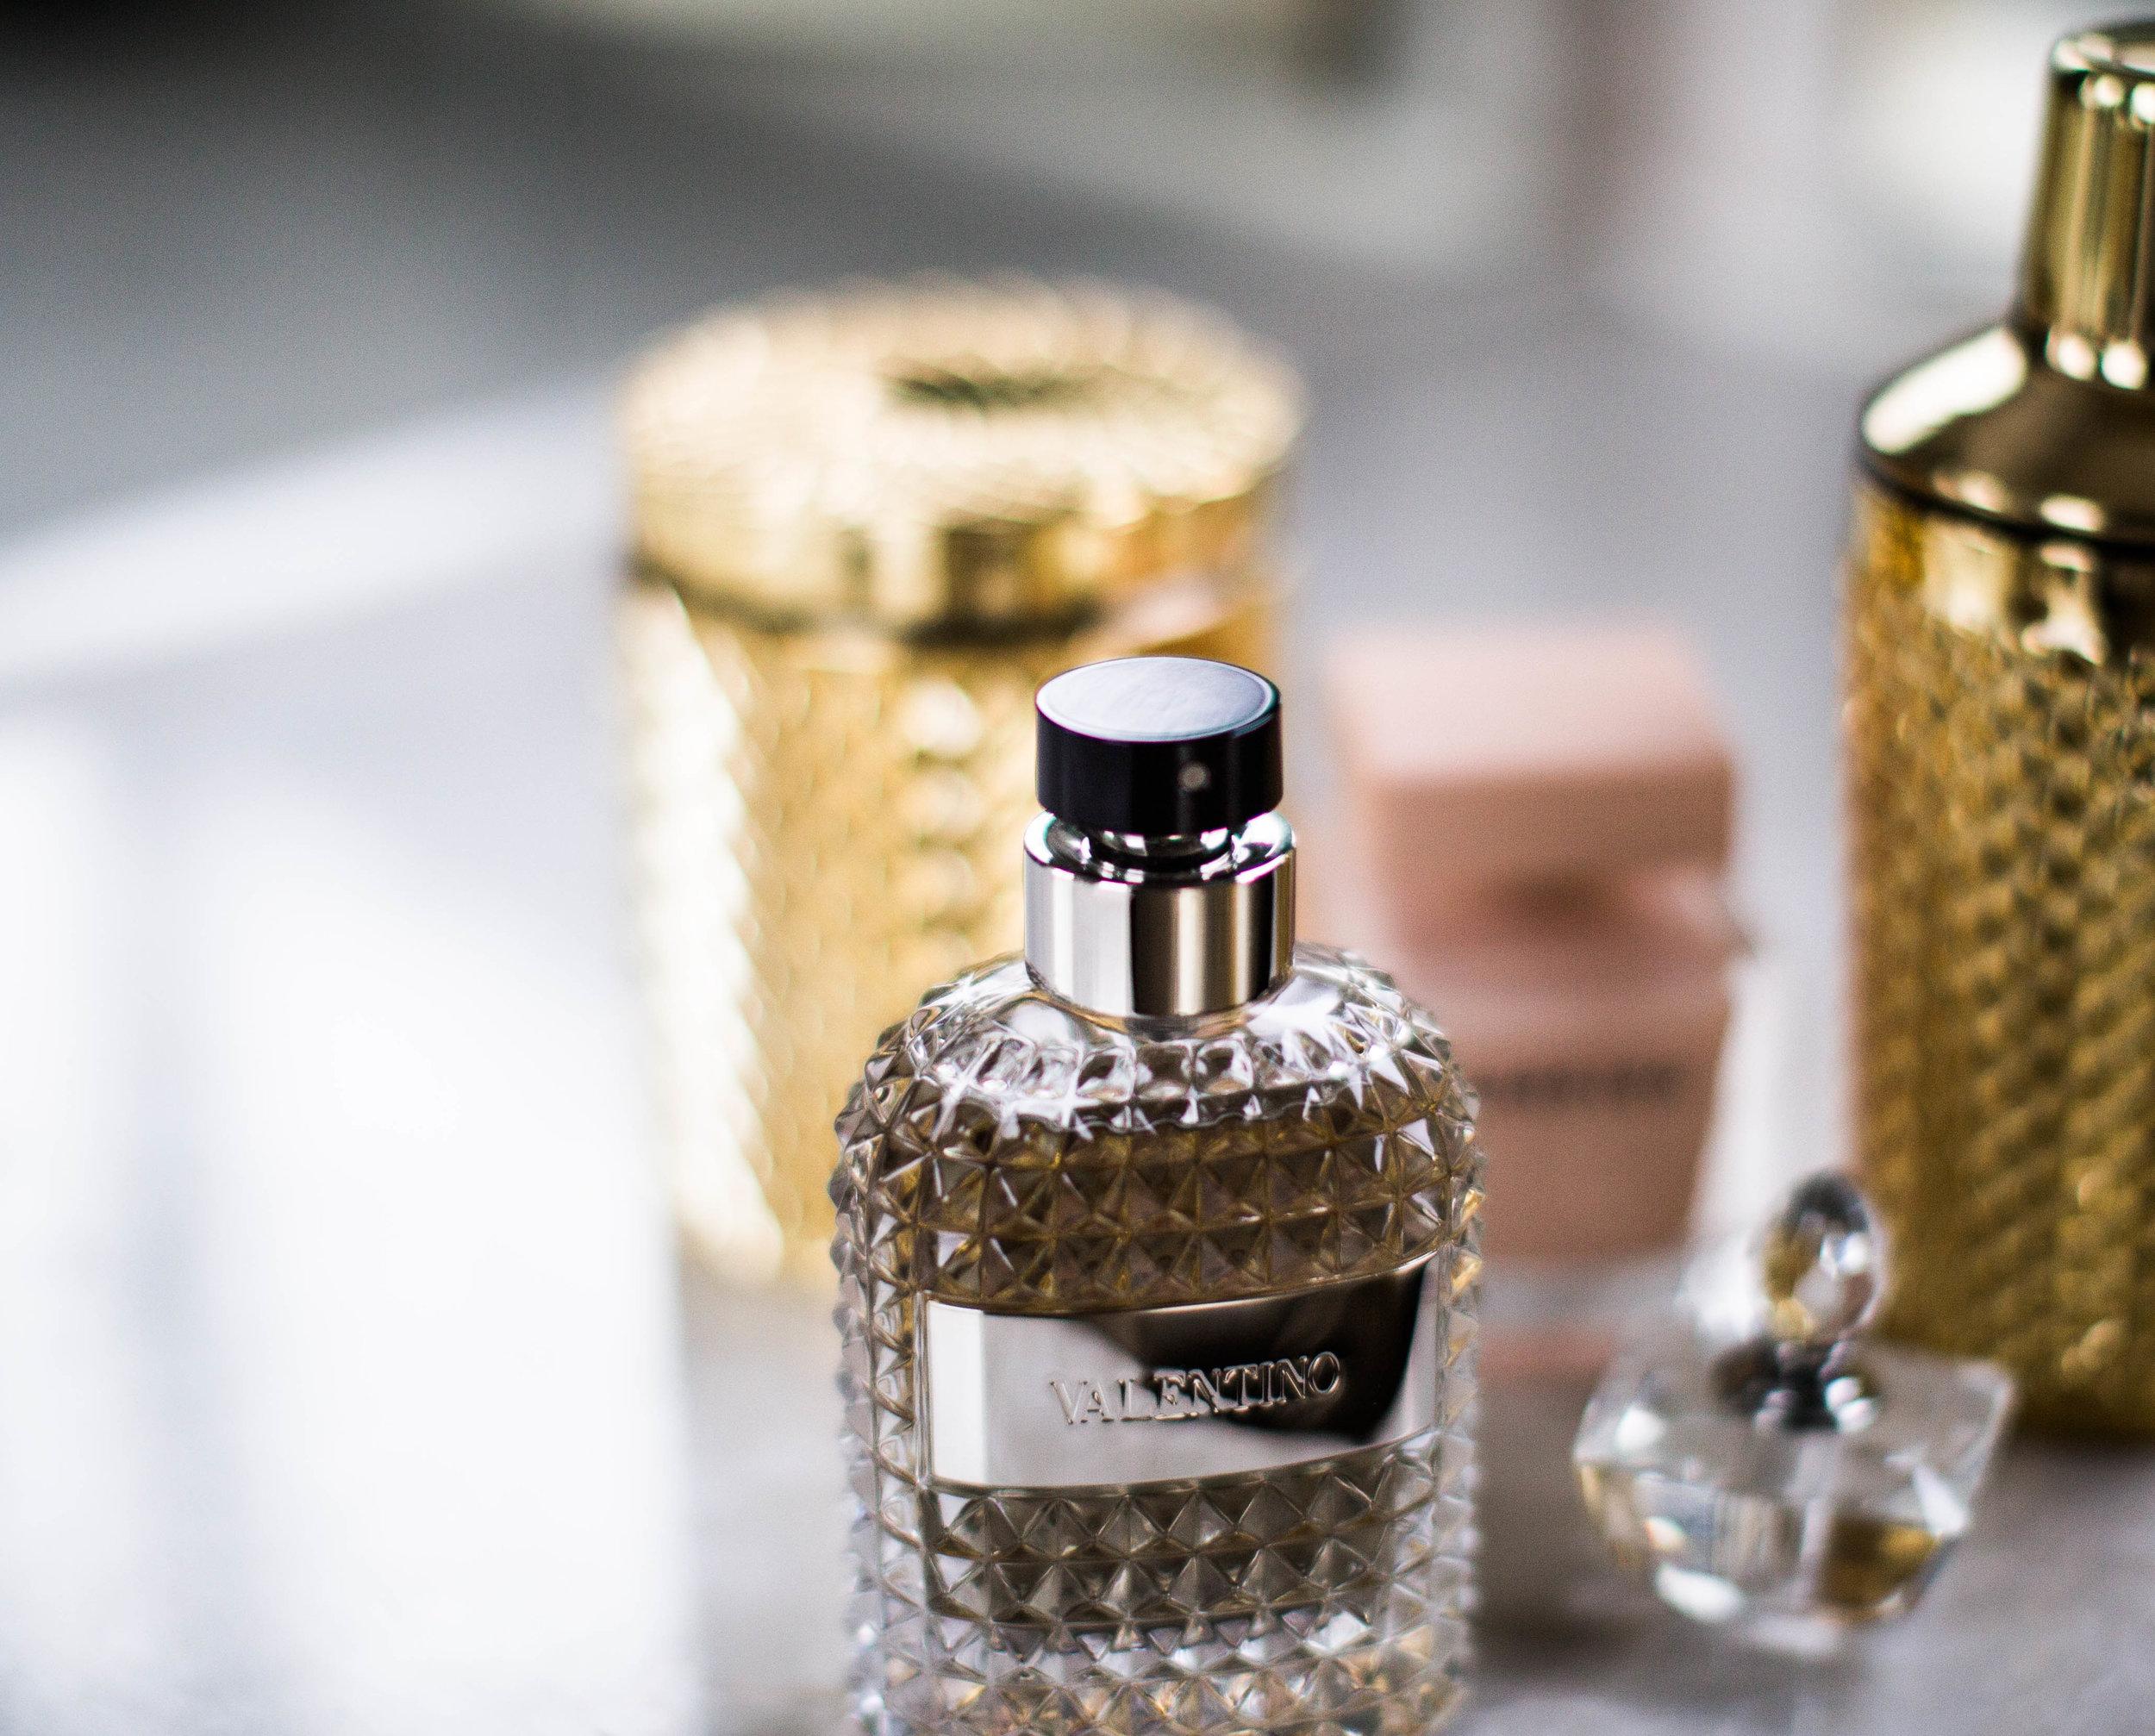 fragrance valentino 2 (1 of 1).jpg